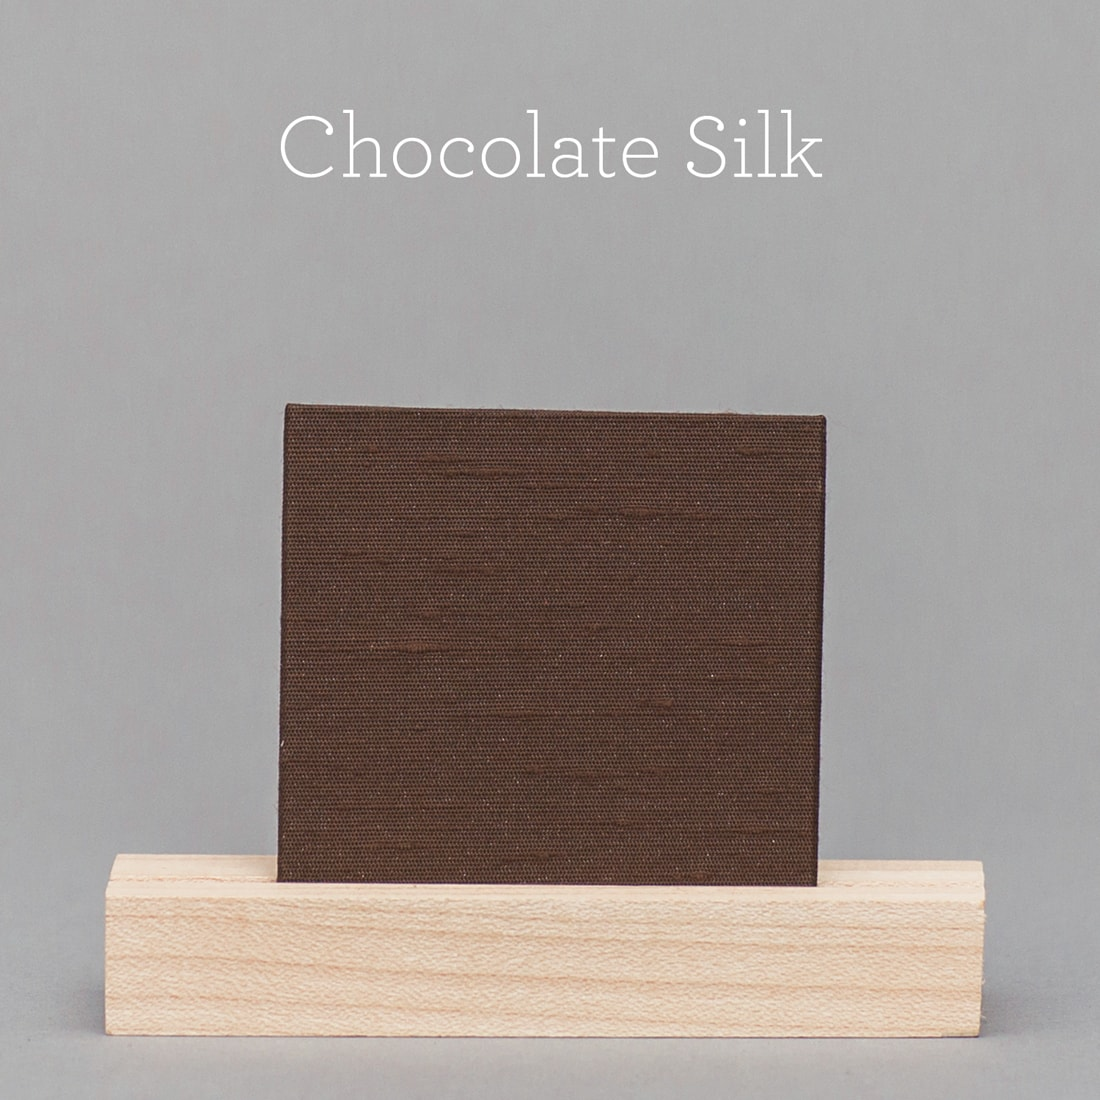 ChocolateSilk